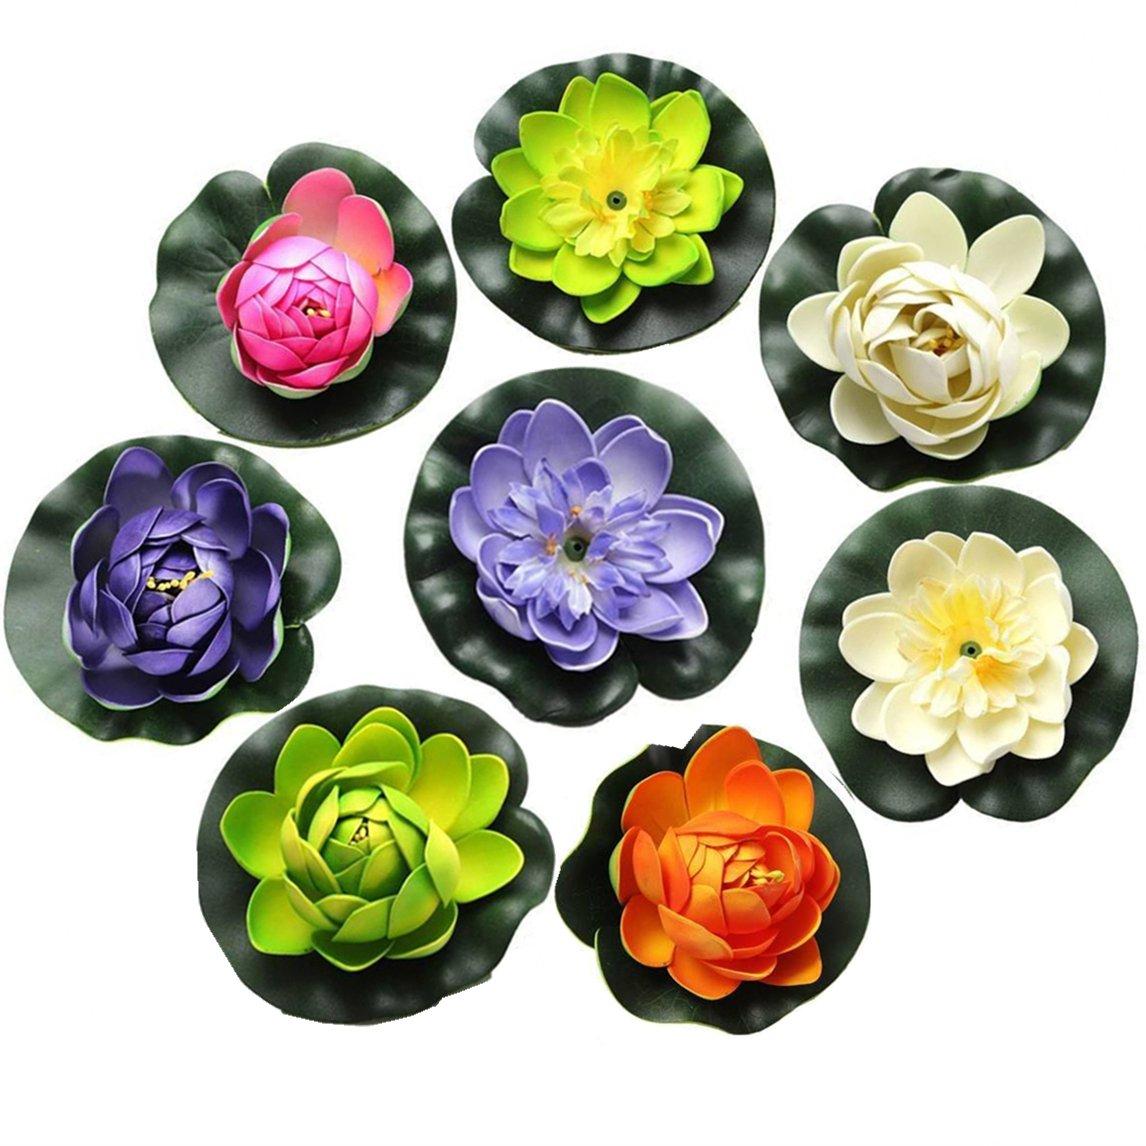 FQTANJU Foam Water Lily Flower Decor Artificial Floating Pond Plants Multicolor (8 Pieces/1.5'' h x 4'' Dia)